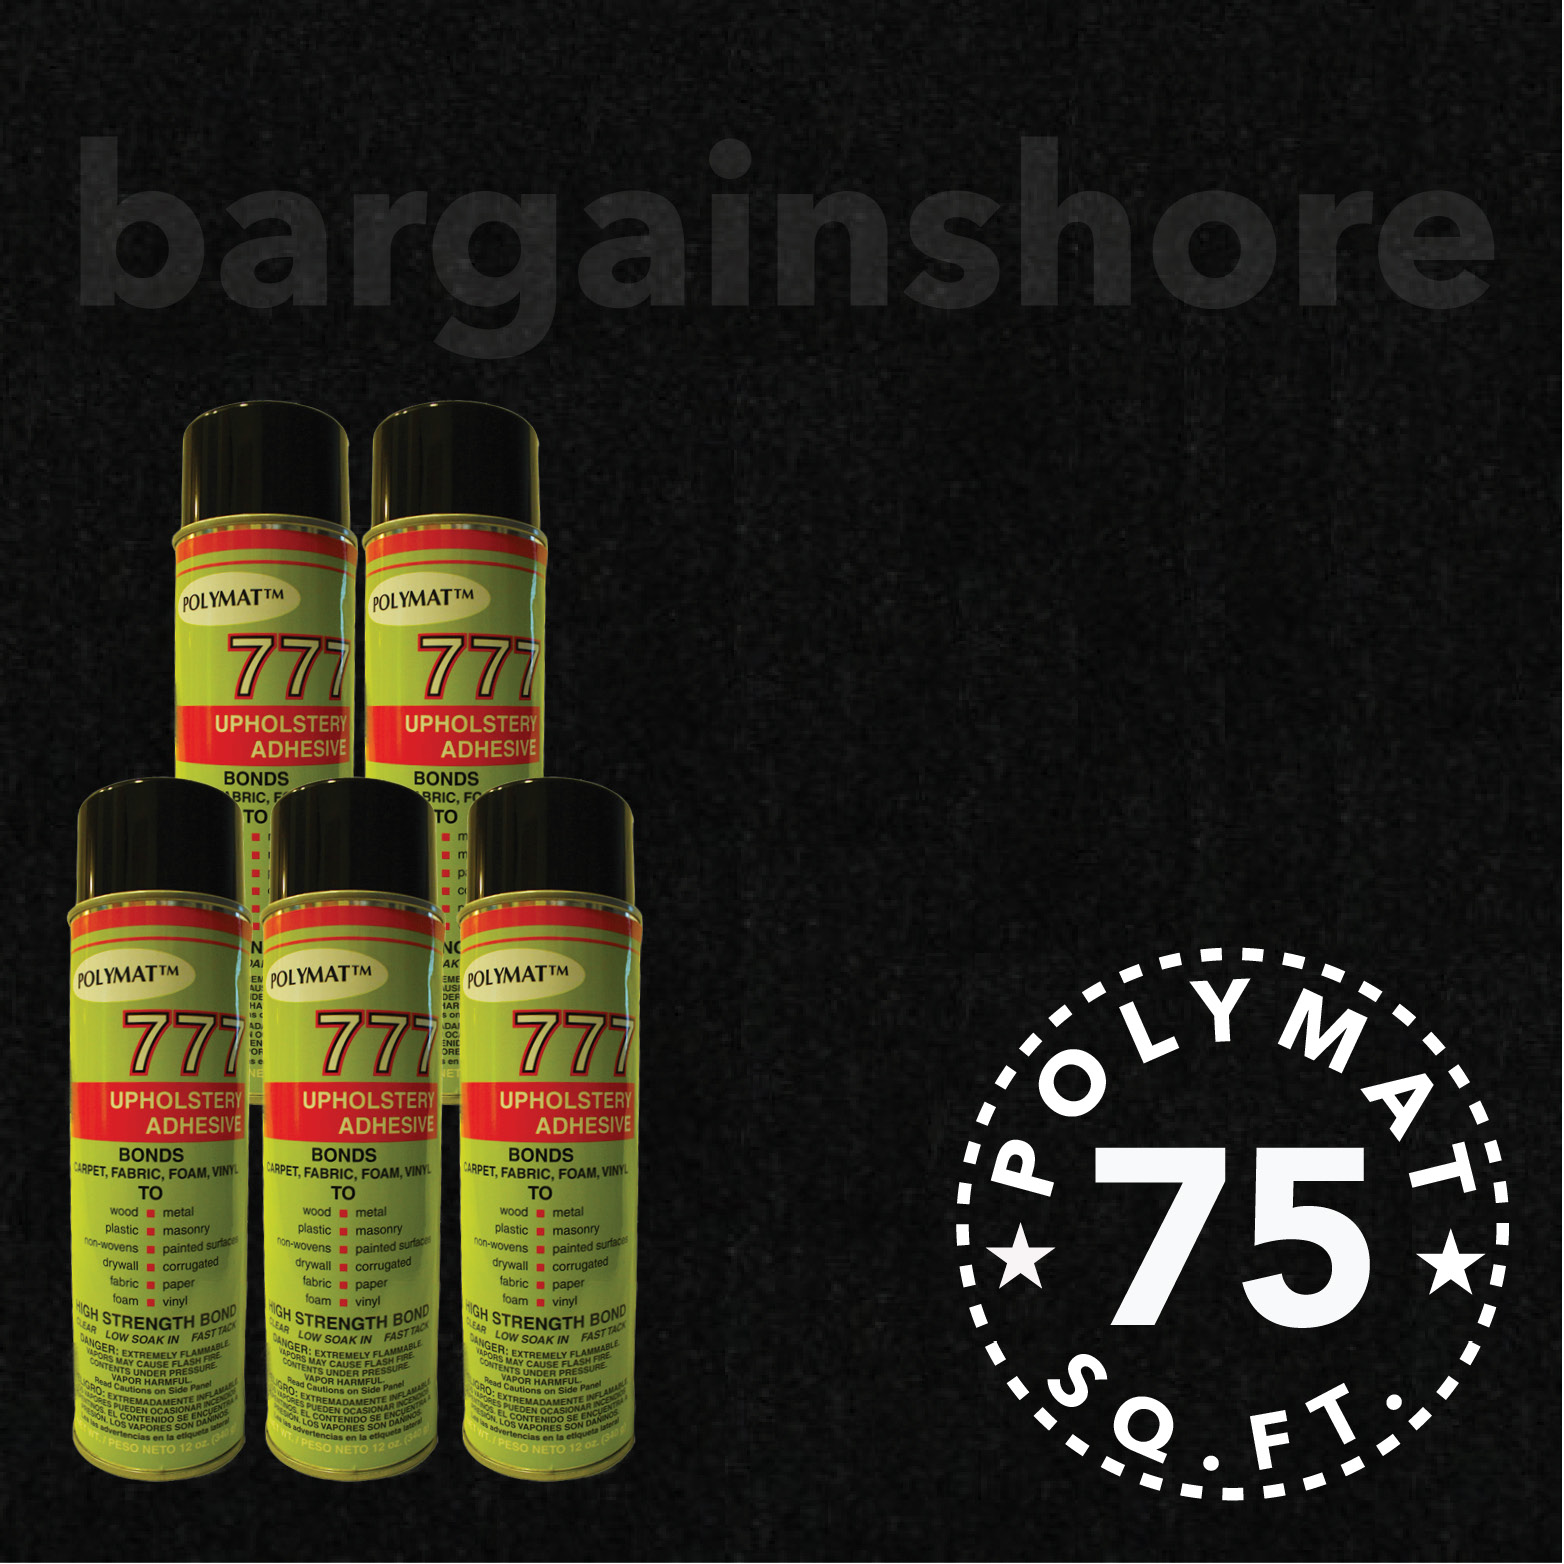 20FT x 3.75FT BLACK Speaker Box Carpet +5 Cans 777 Fabric Spray Glue…